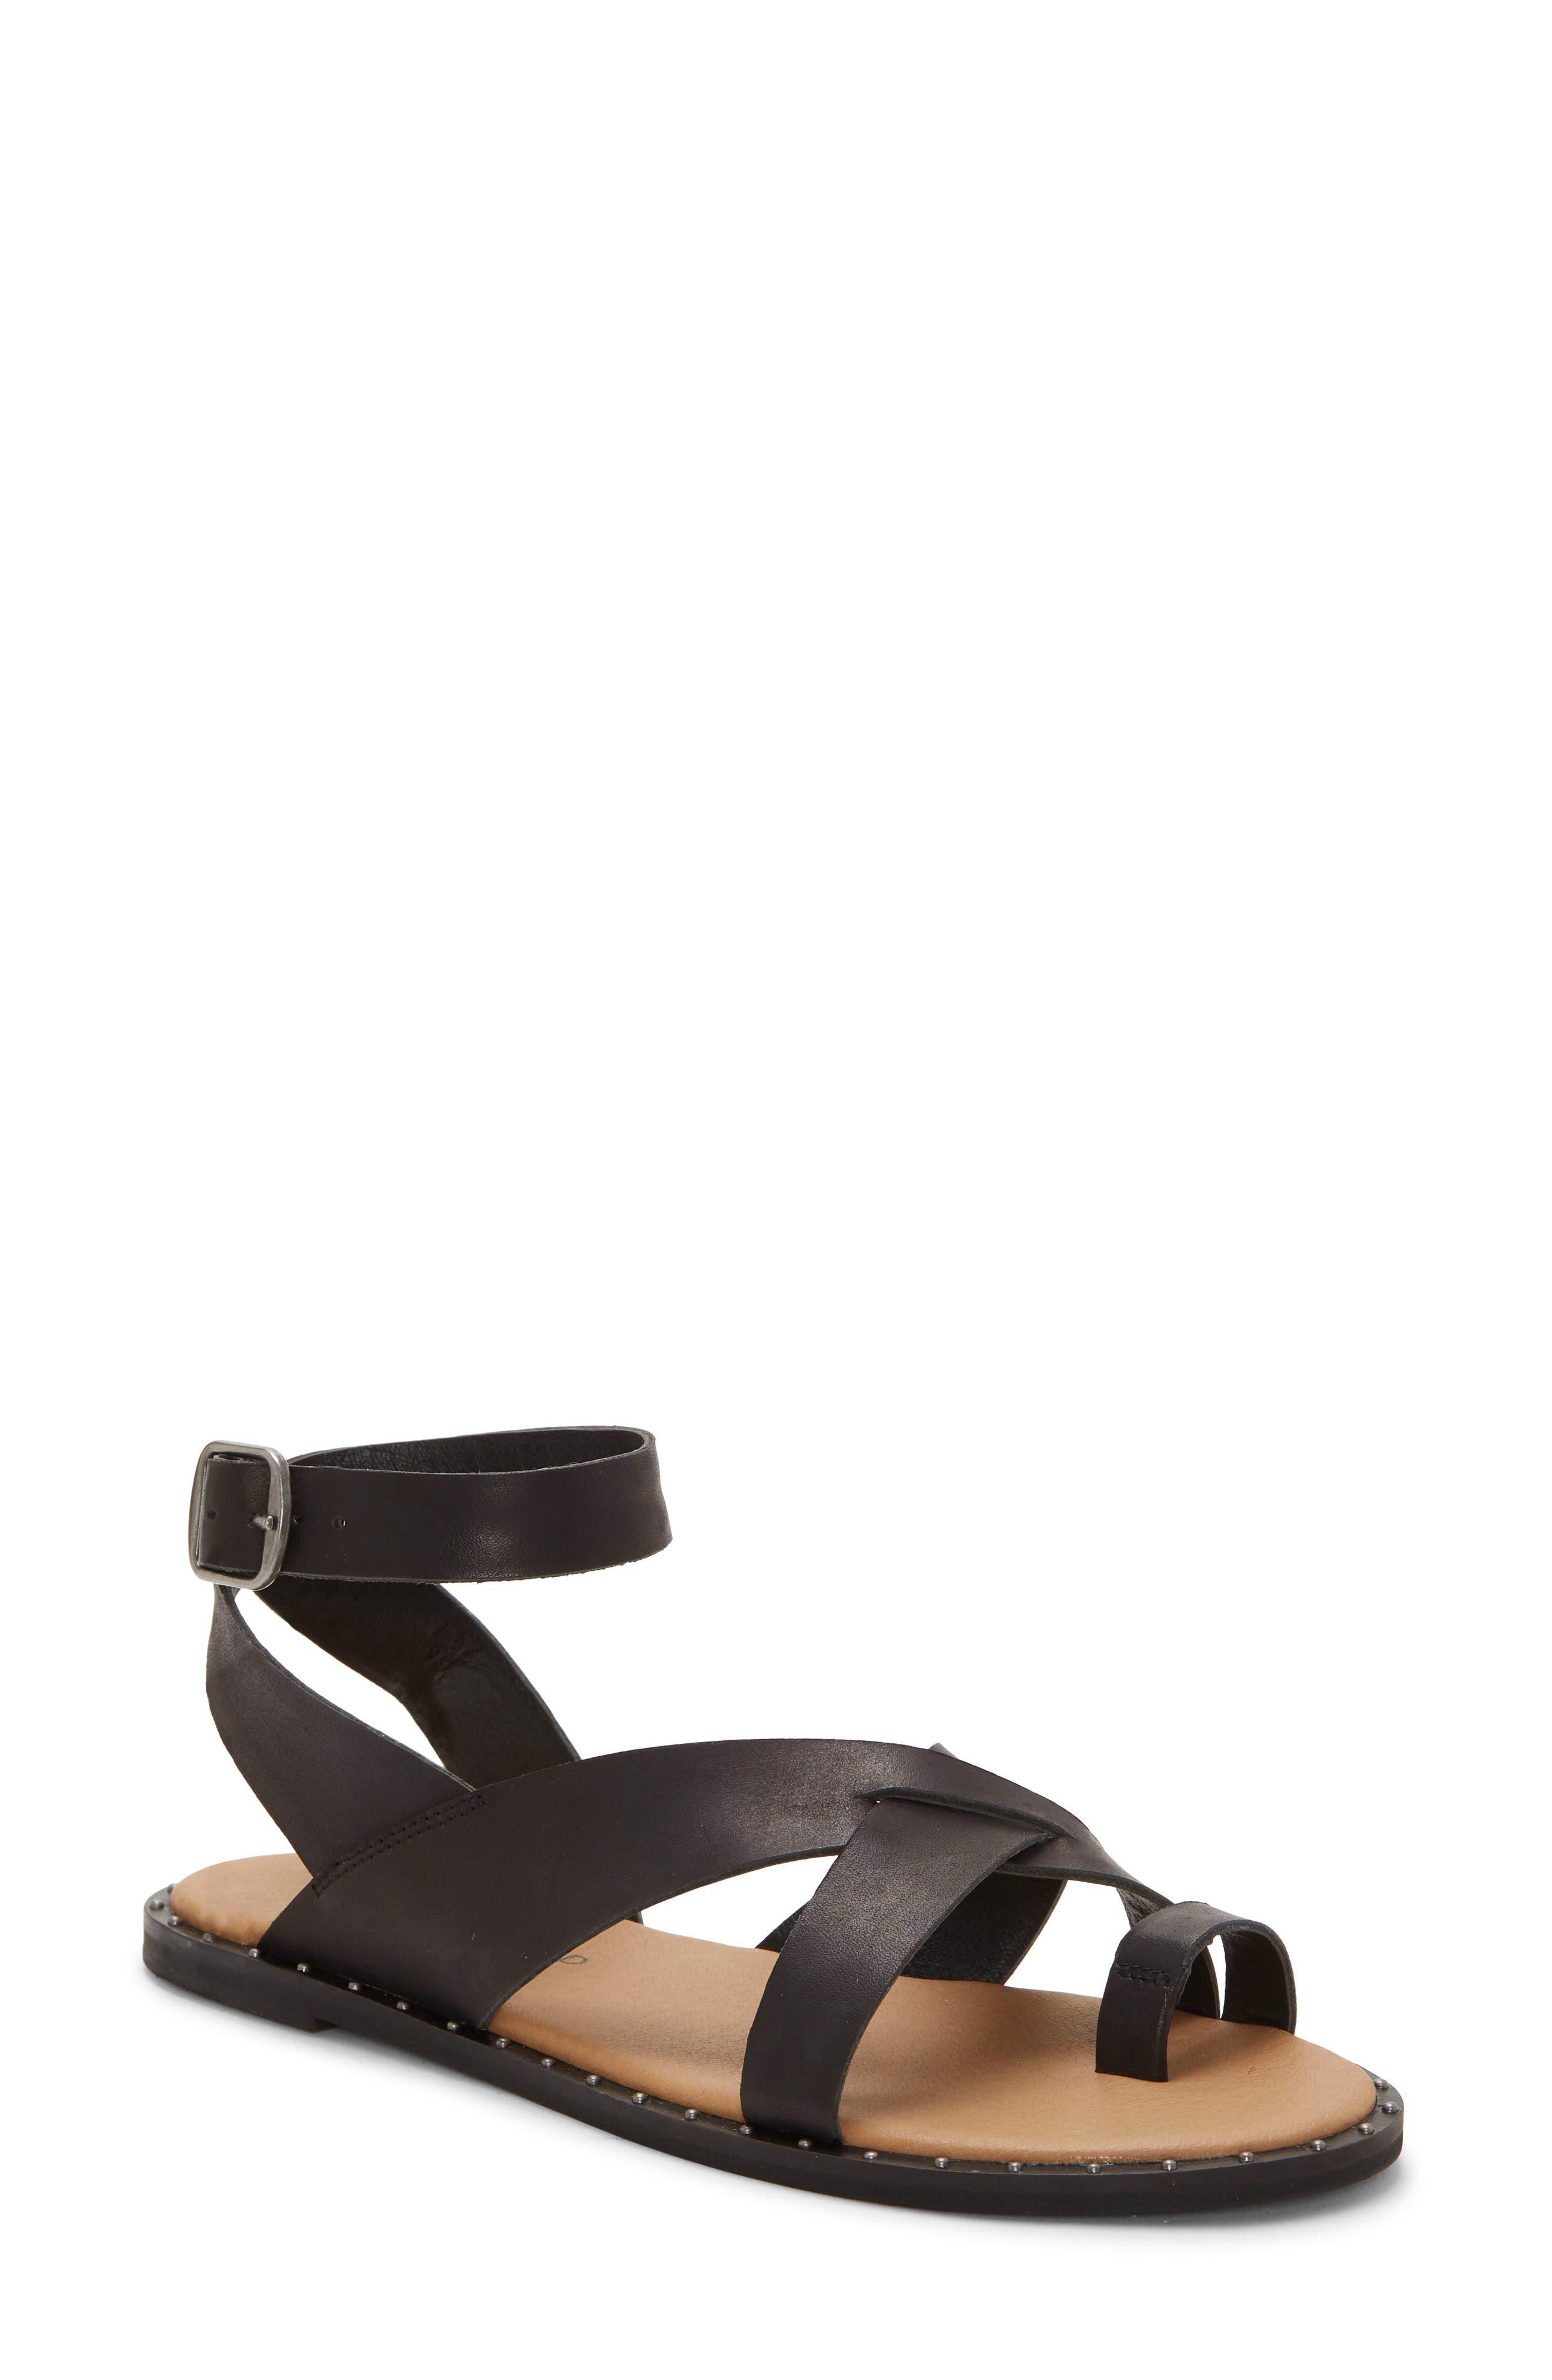 Lucky Brand Farran Toe Loop Sandal- Black